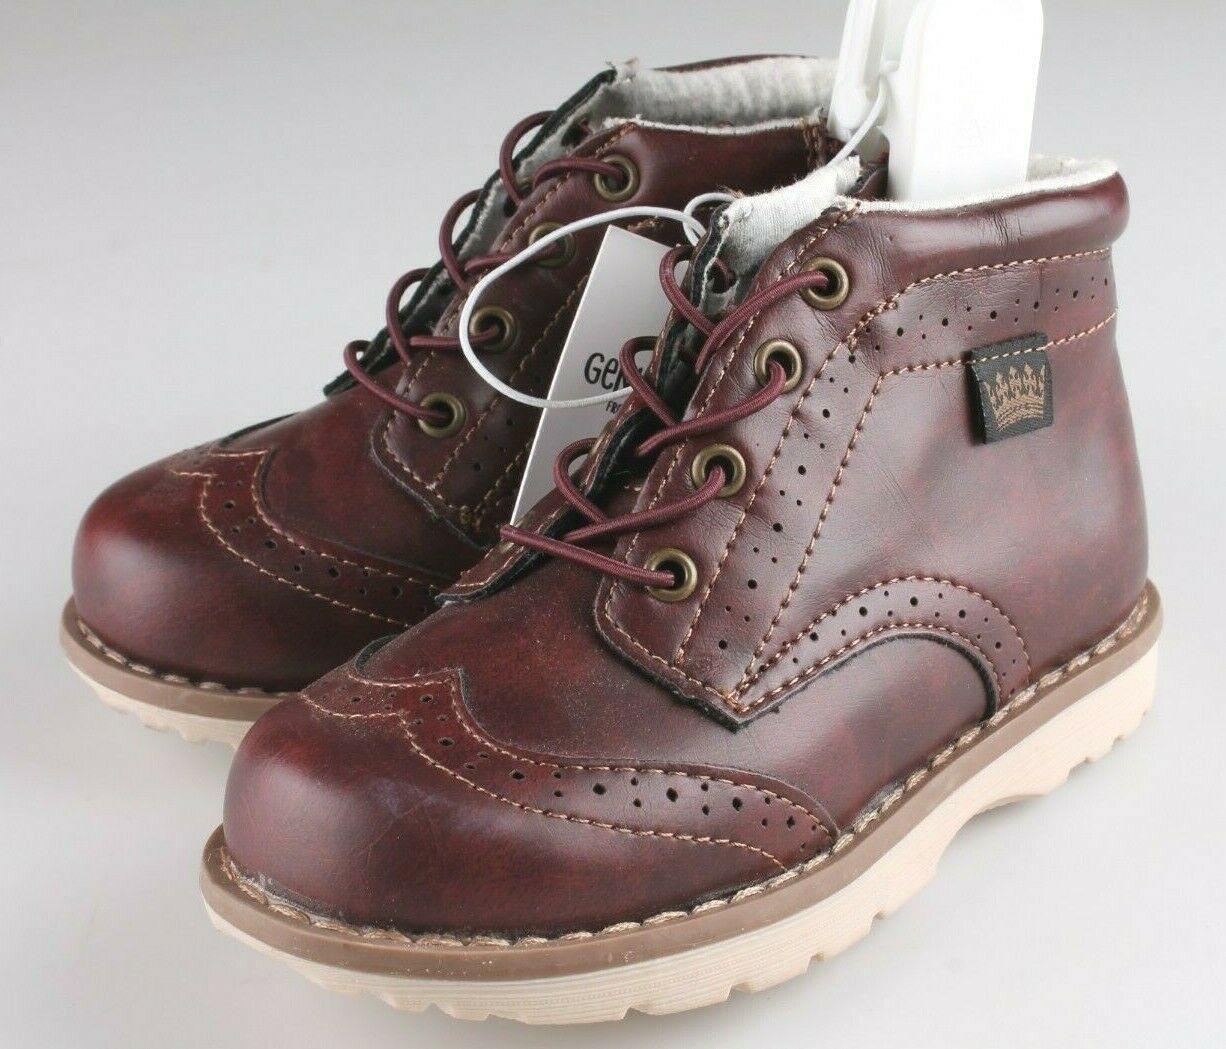 OshKosh B'Gosh Toddler Burgundy Brayan Wingtip Fashion Boots Shoes NEW